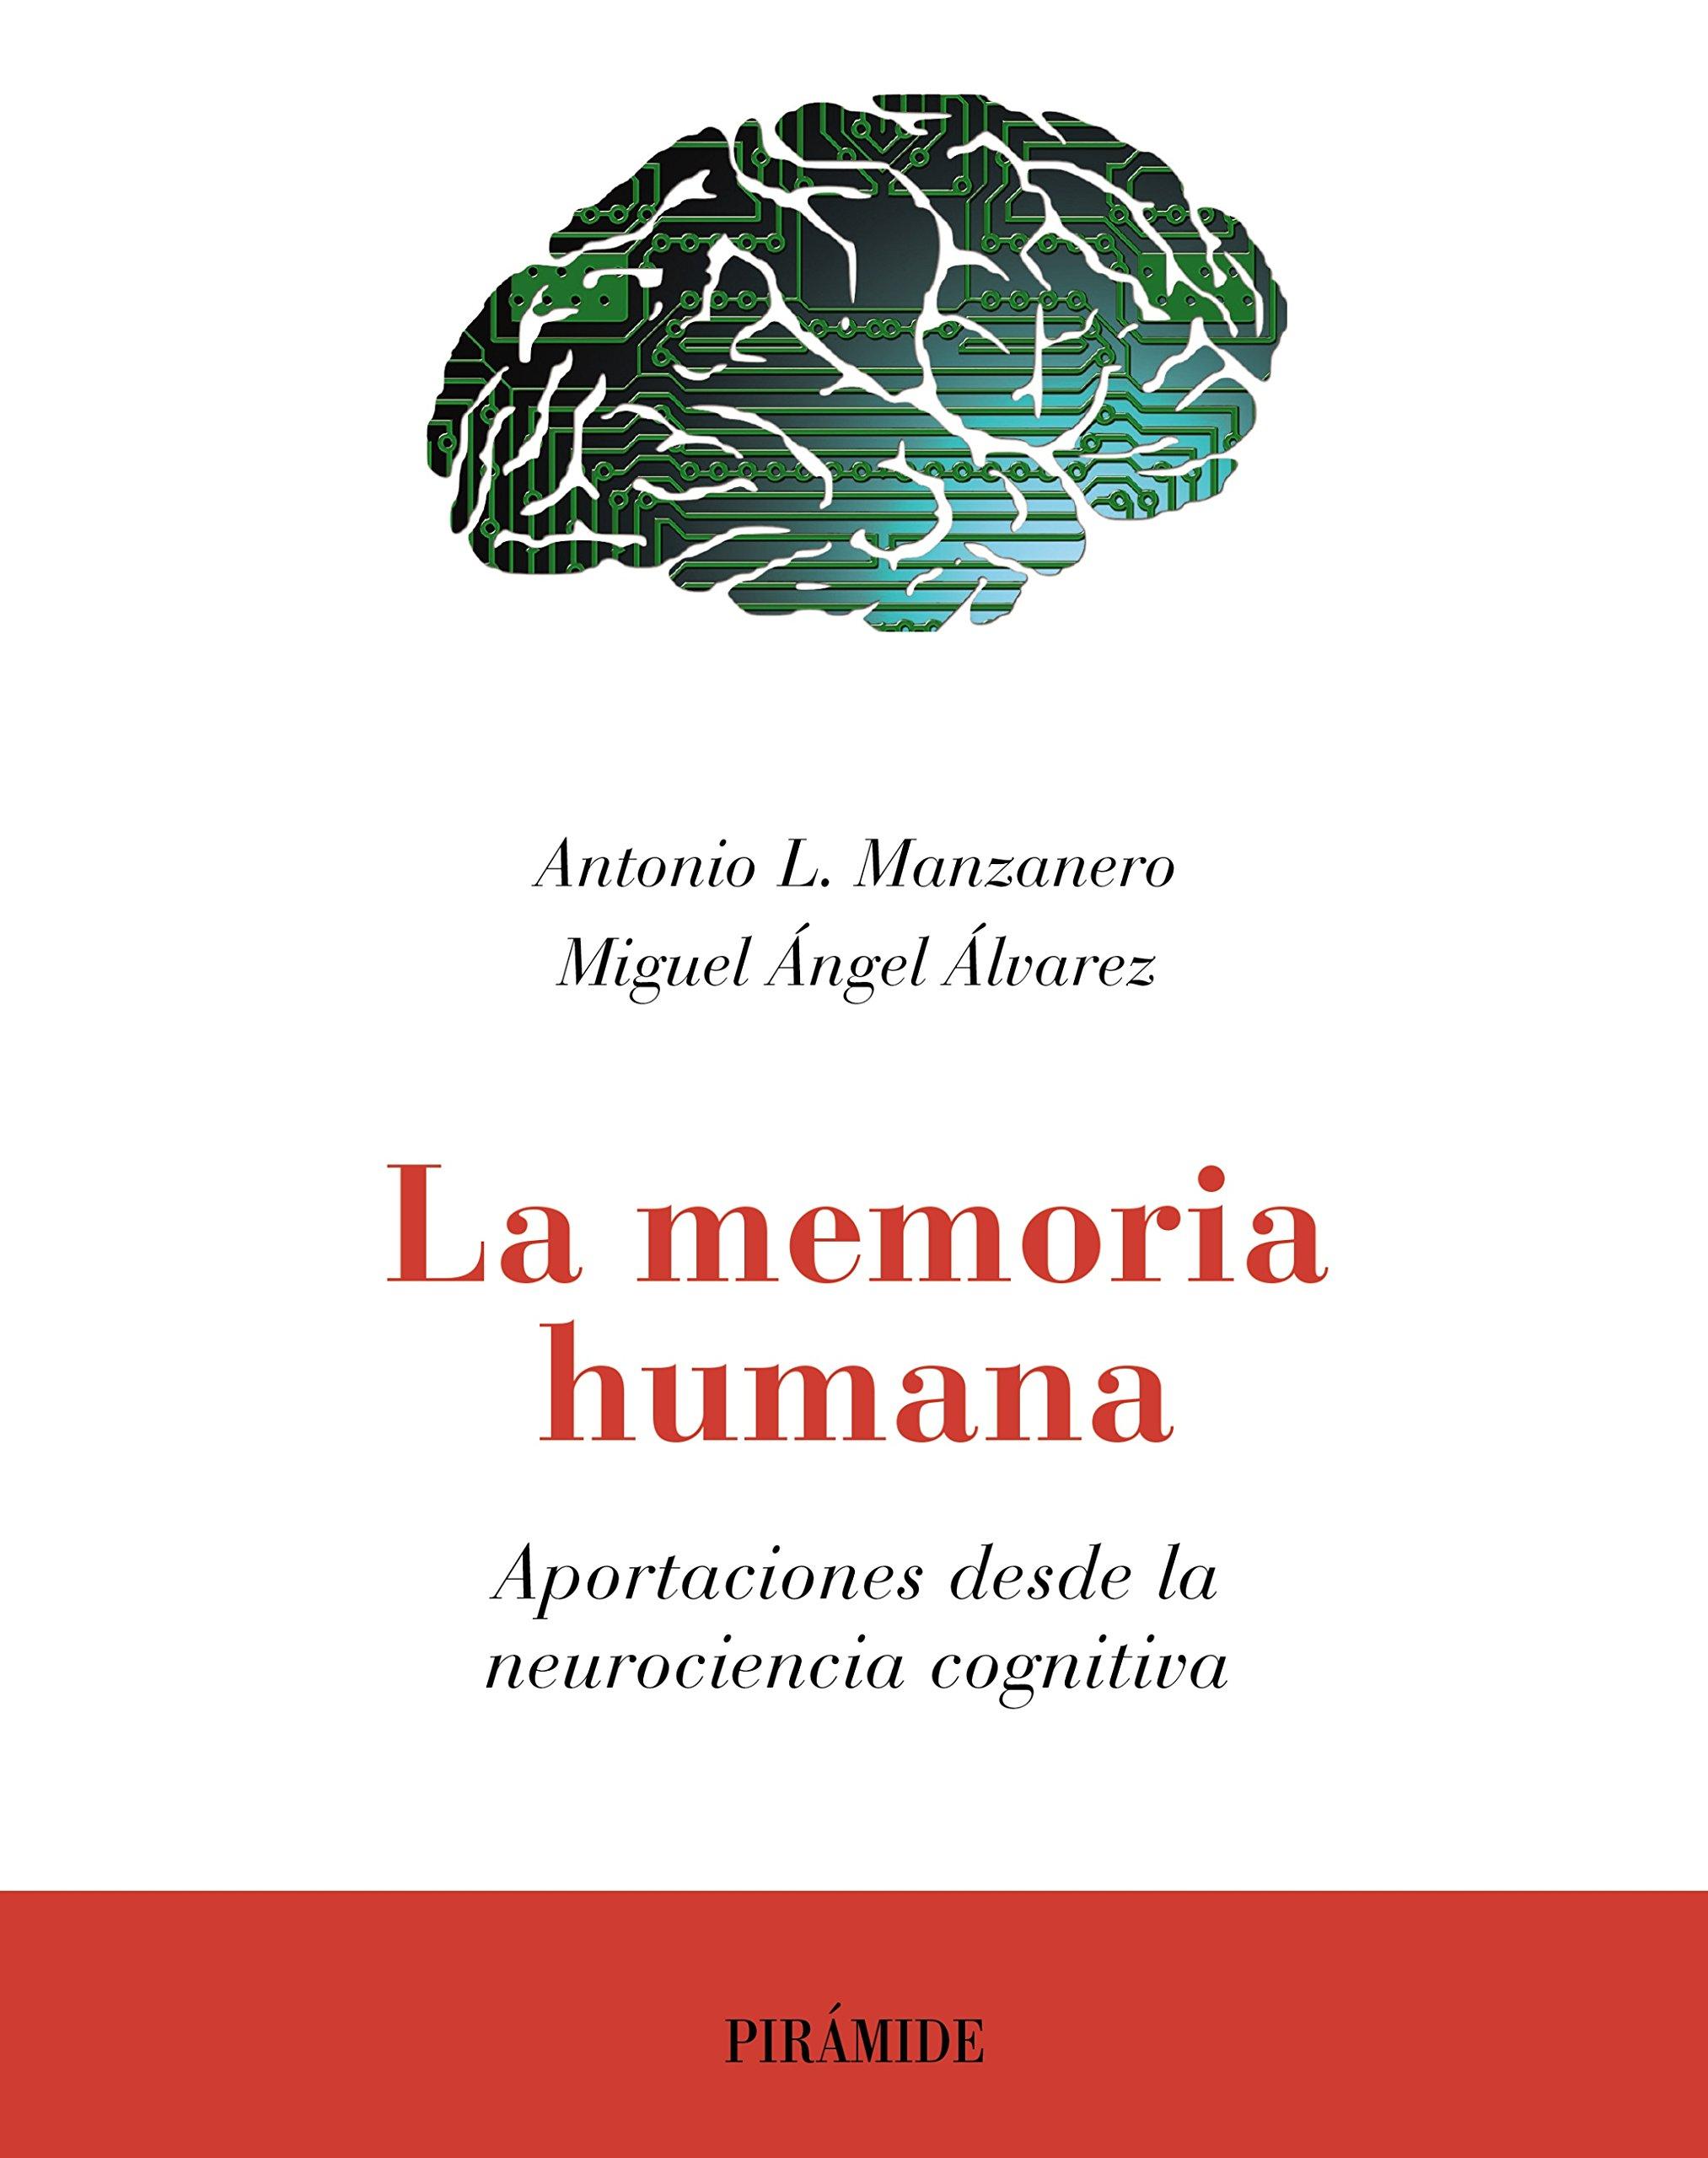 La memoria humana: Aportaciones desde la neurociencia cognitiva